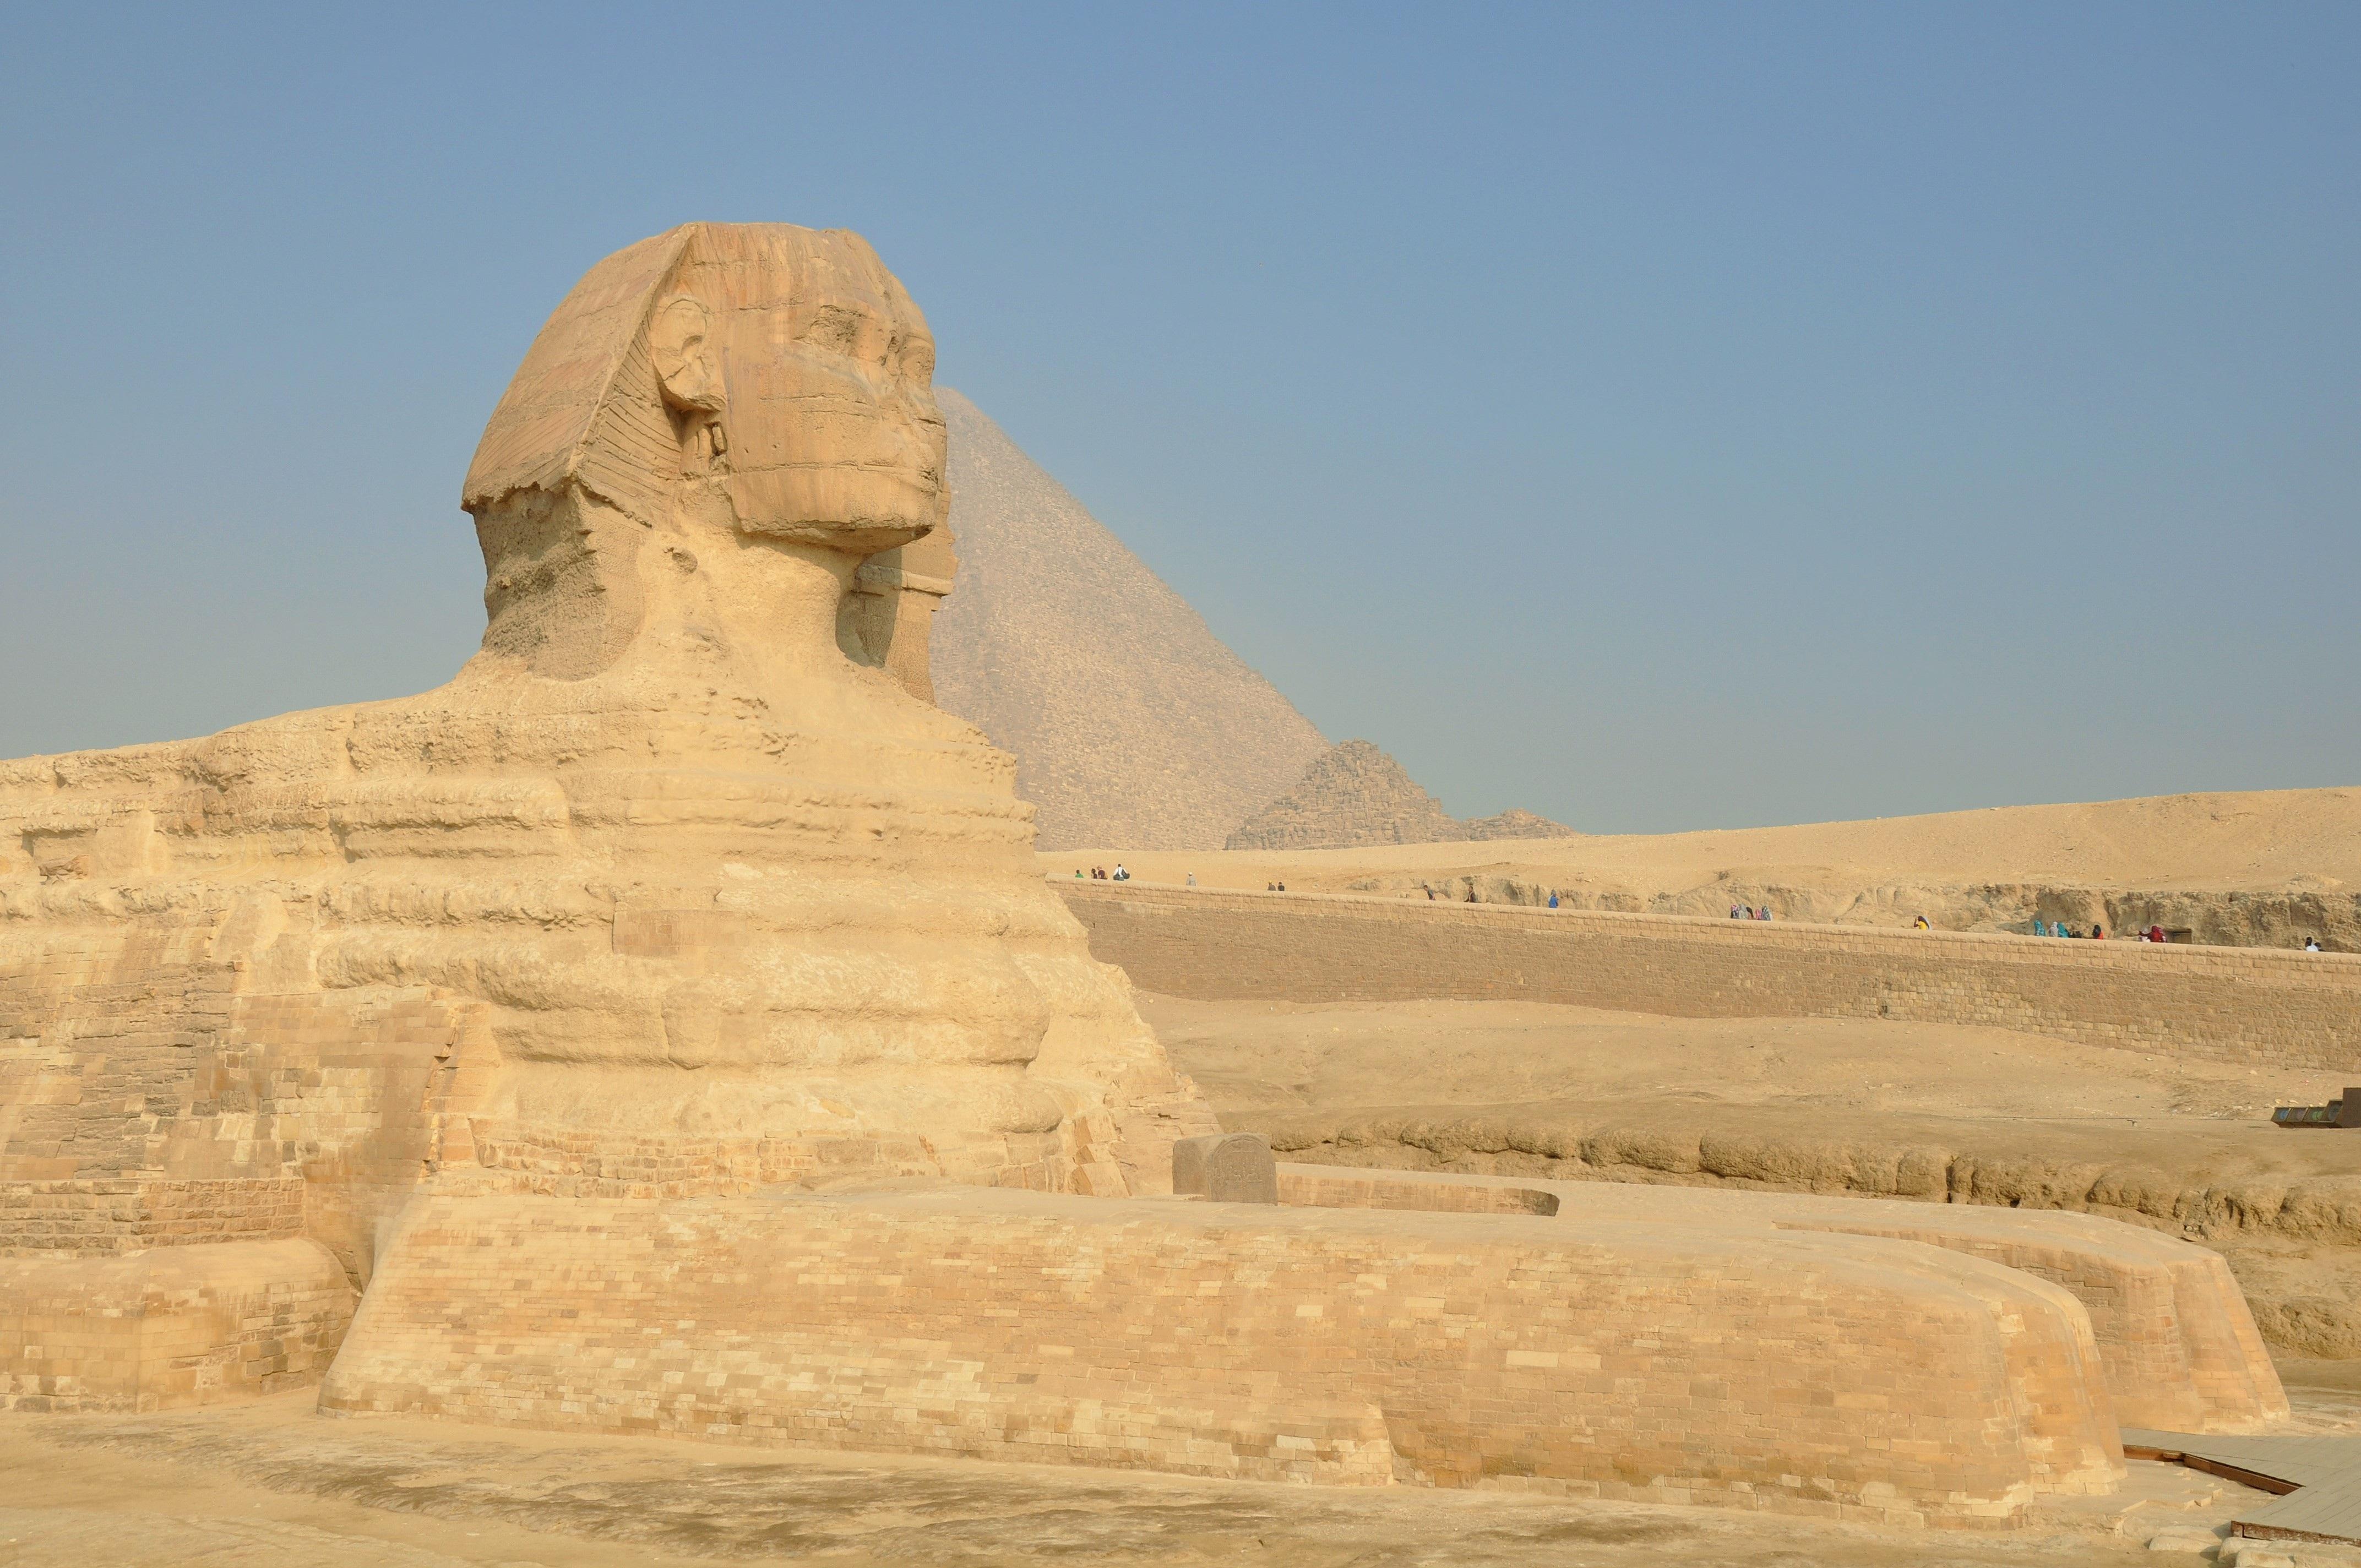 Gambar Pemandangan Pasir Batu Gurun Monumen Pembentukan